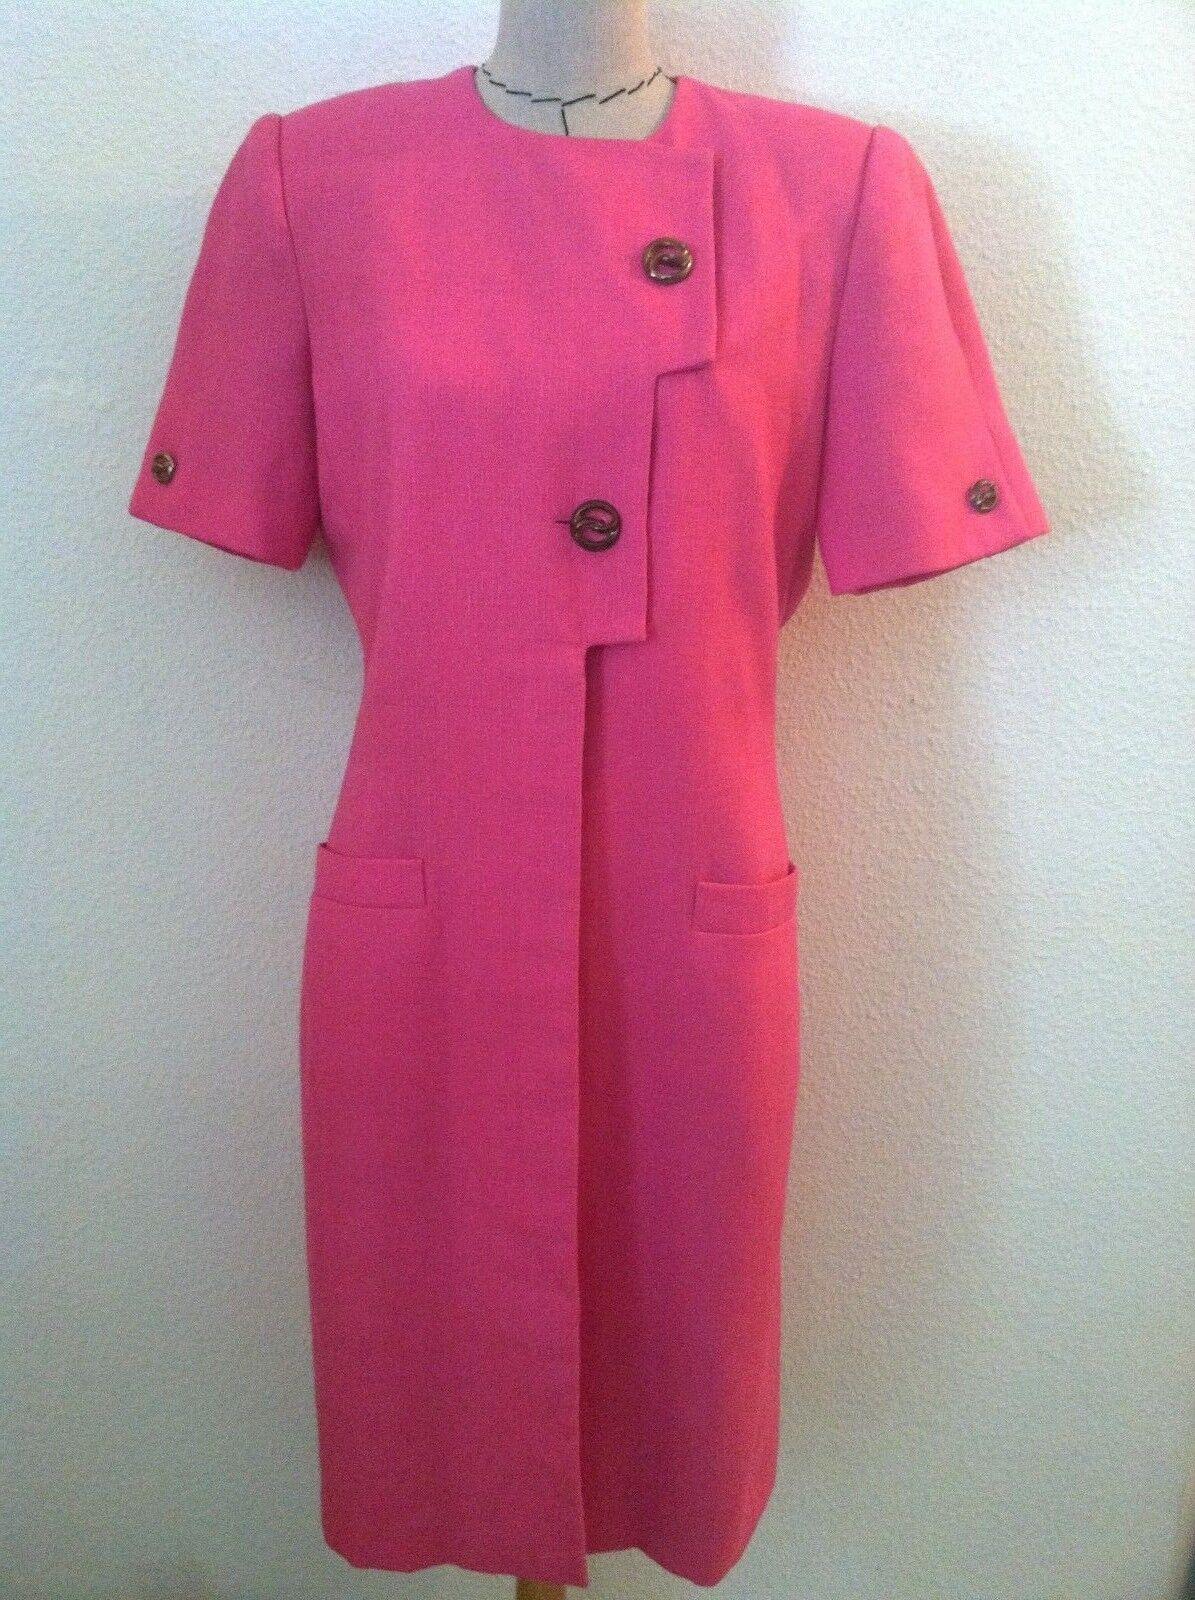 Vintage 90s women dress Kasper pink metal button wiggle sheath tailored 8 10